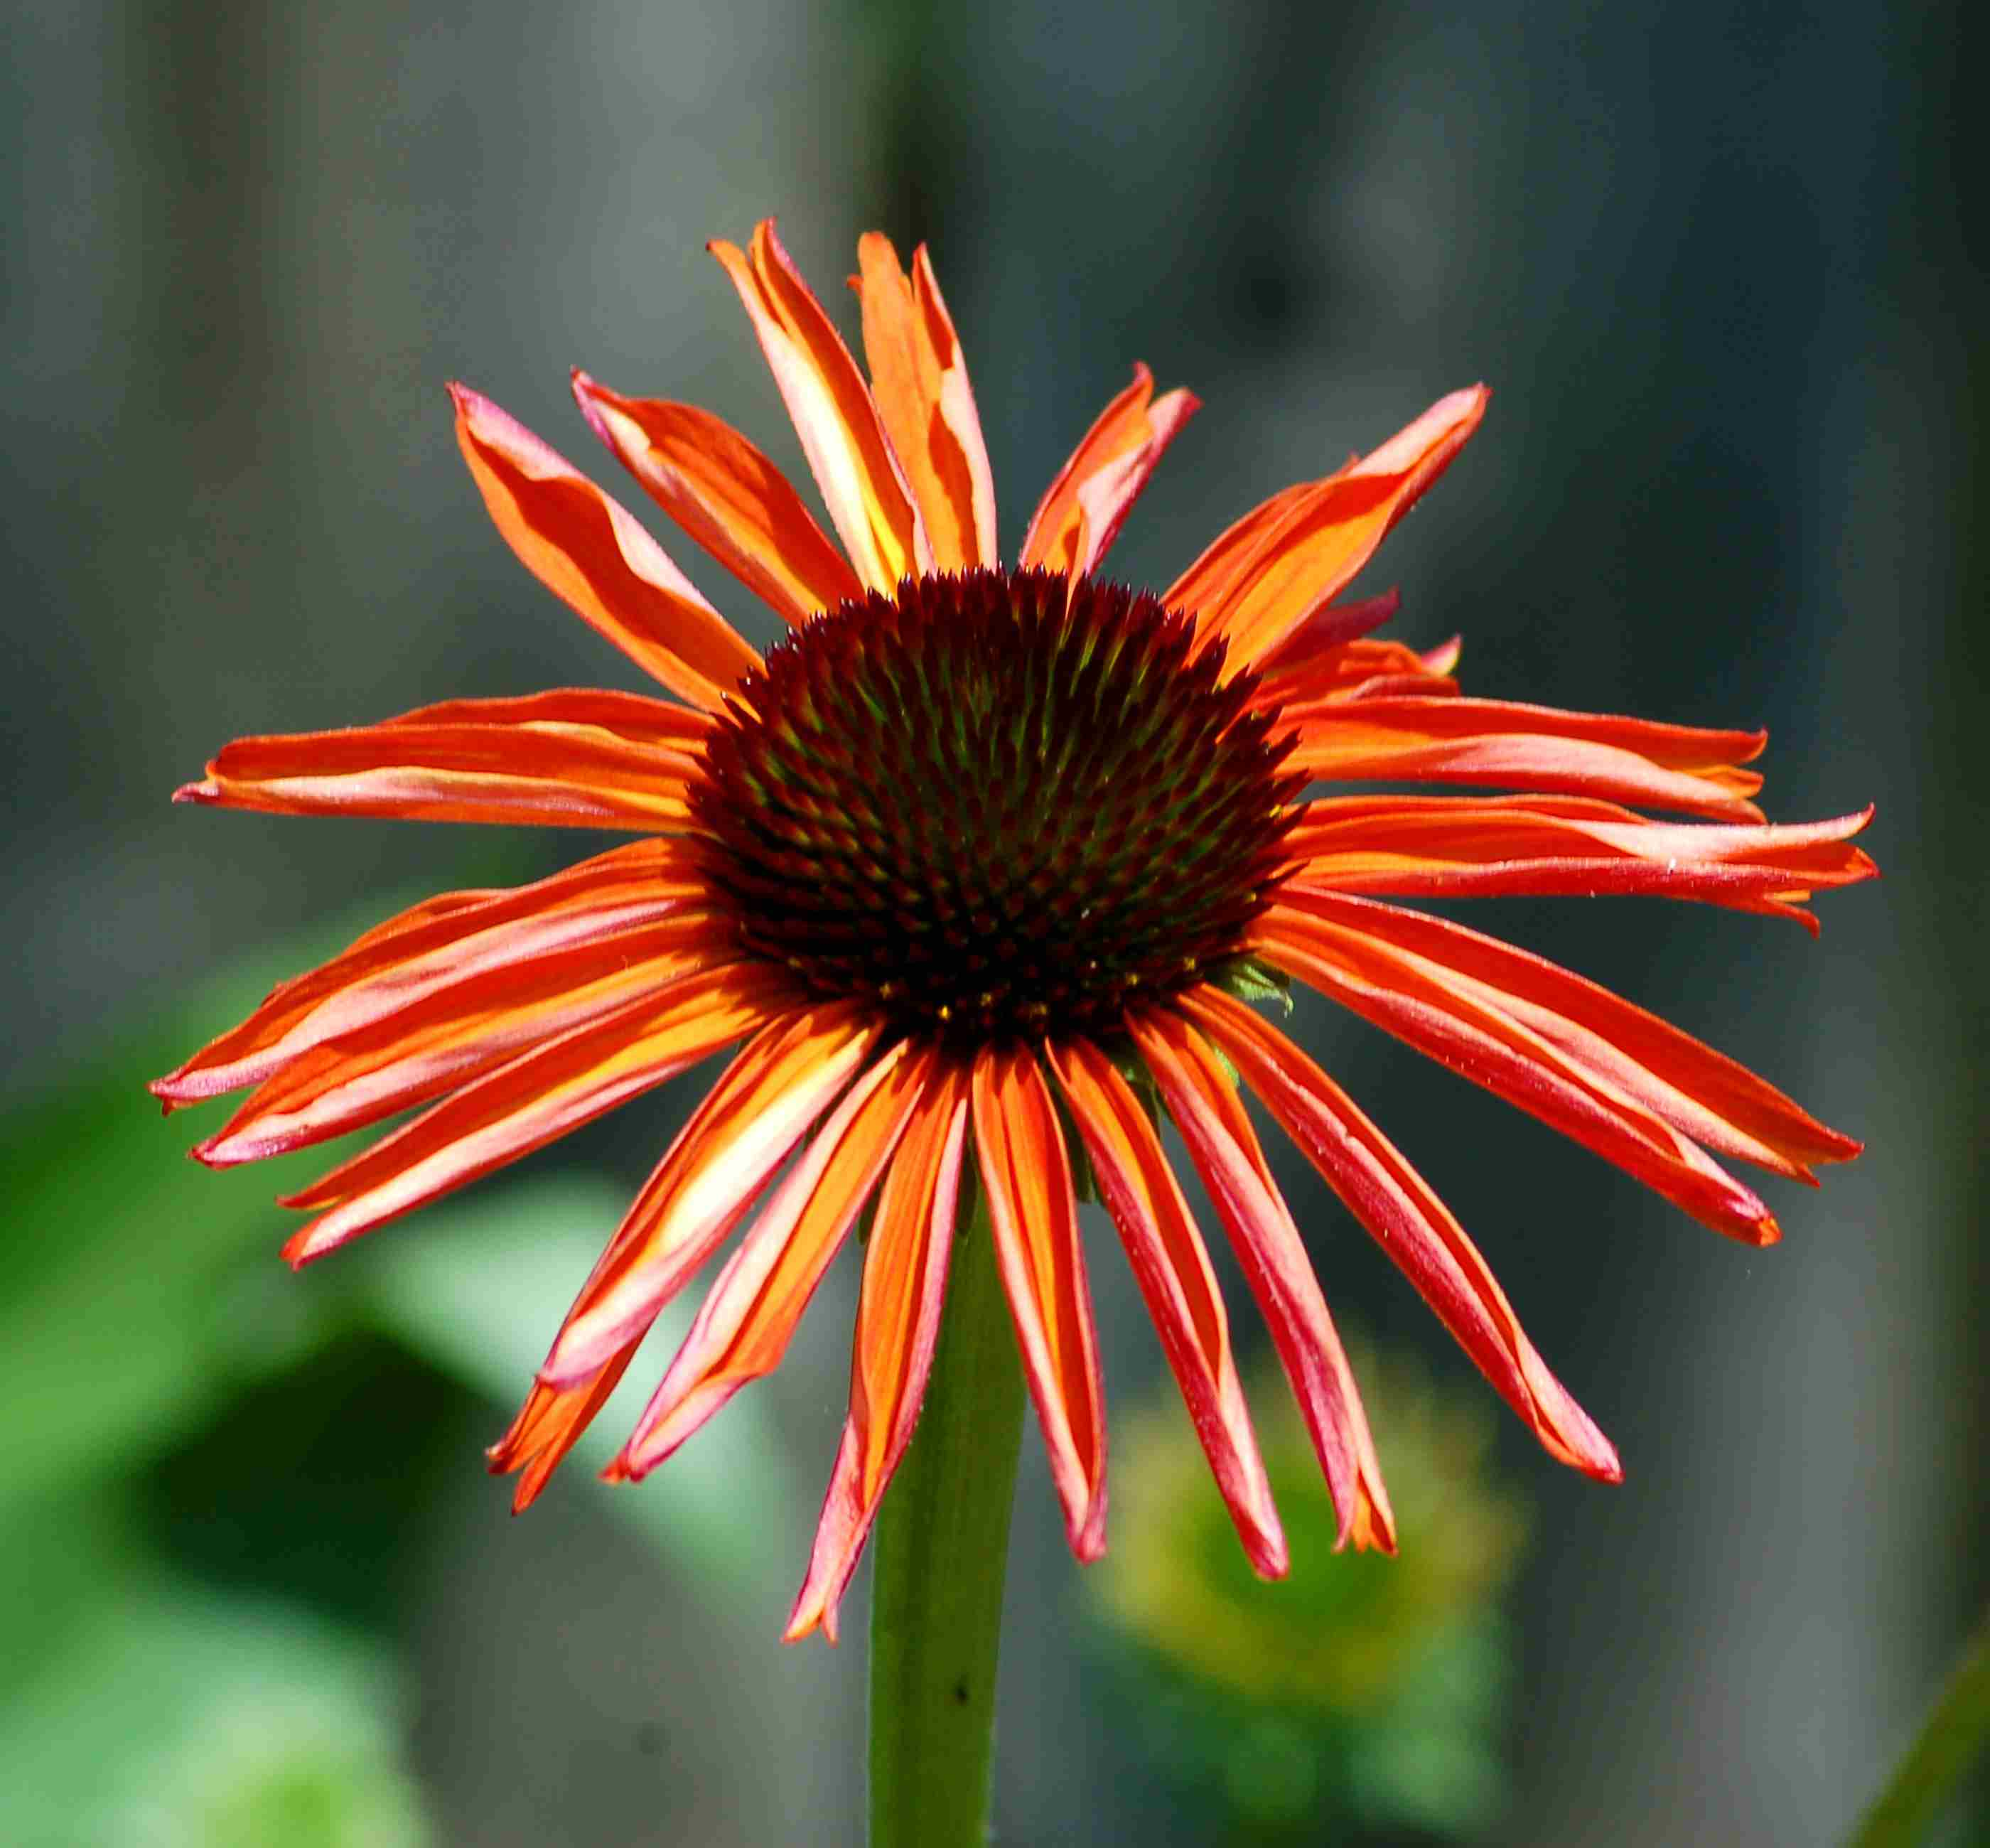 'Firebird,' which is an orange-flowered coneflower, is in bloom